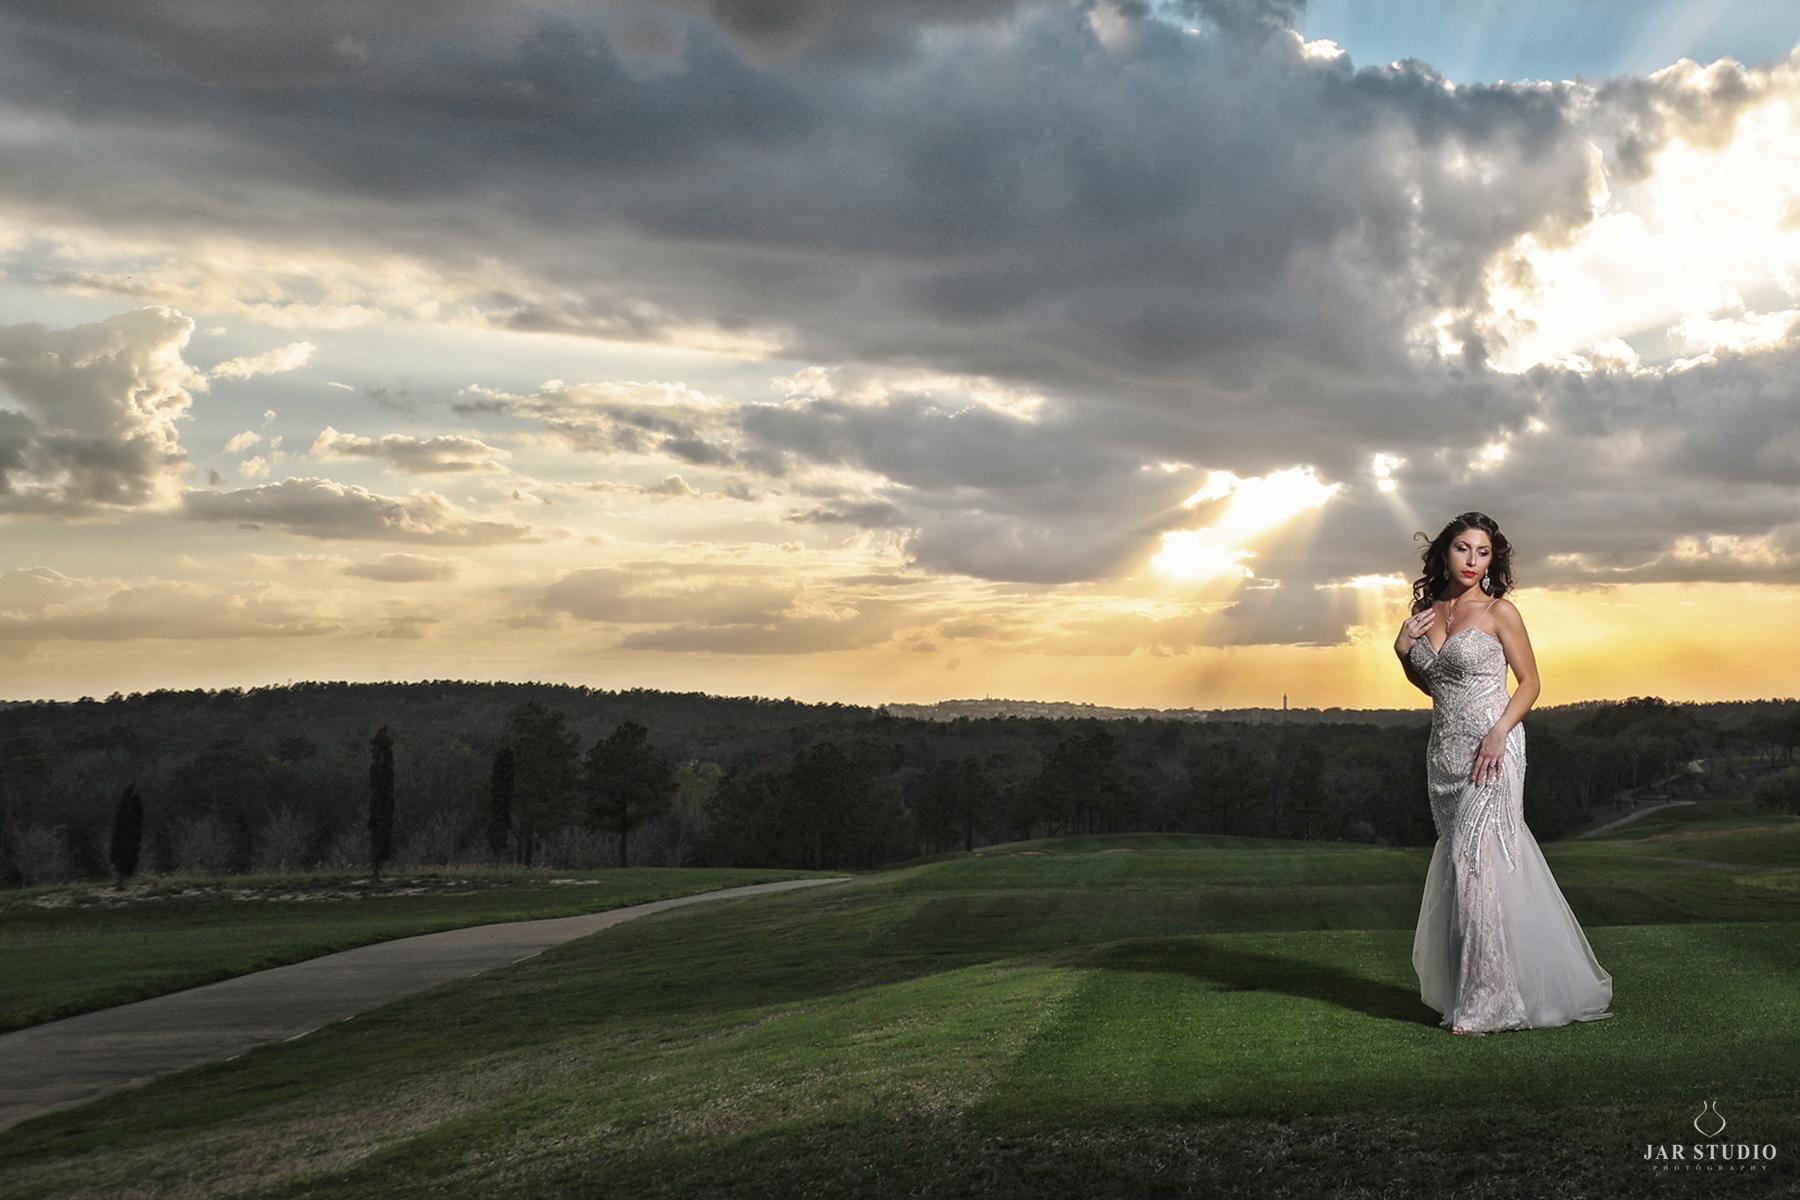 19-dreamy-bridal-photograph-jarstudio.jpg